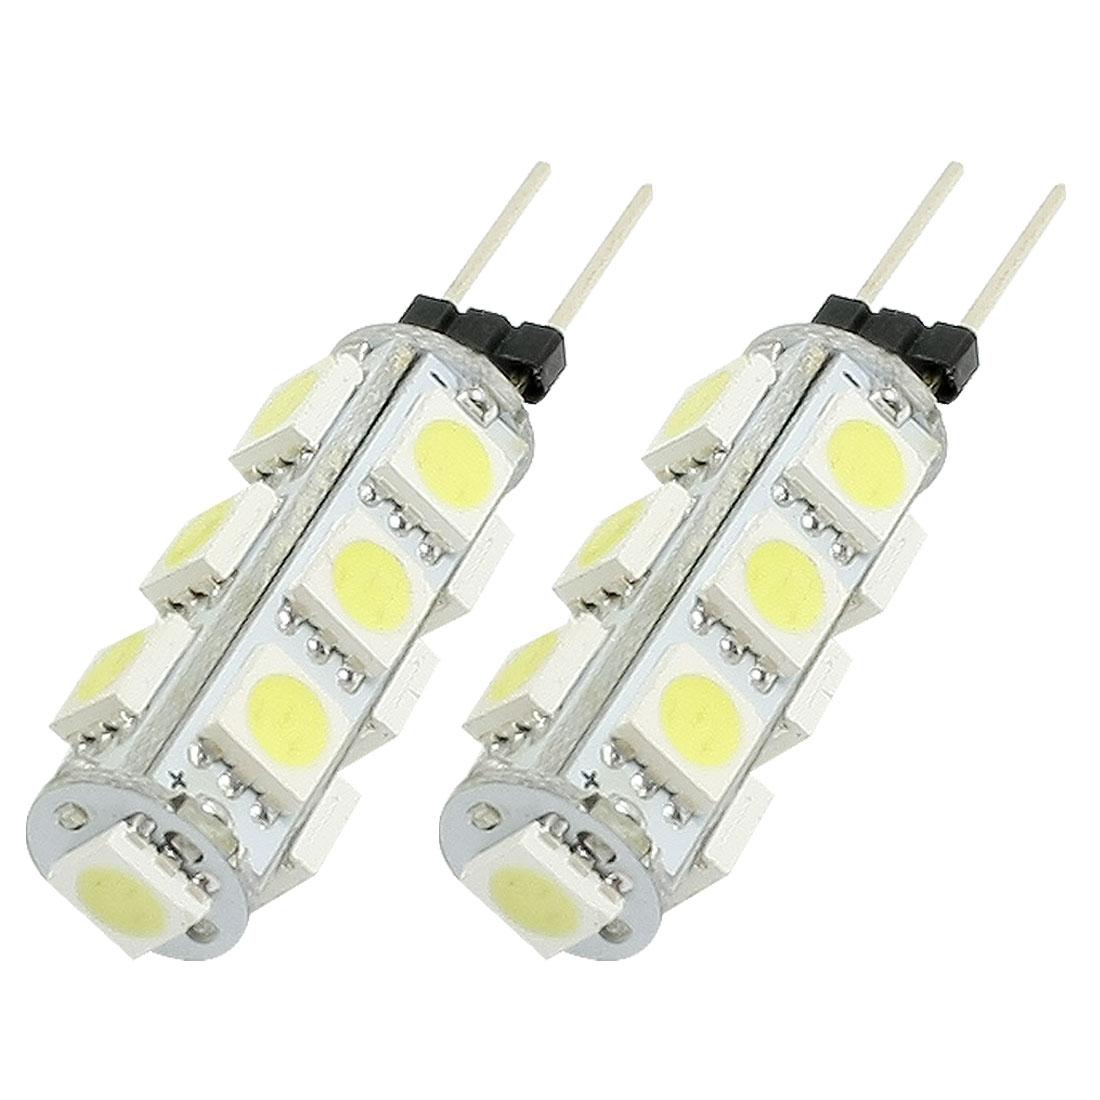 2 Pcs Vertical Pin G4 Base White 5050 SMD 13 LED Bulb Light Lamp